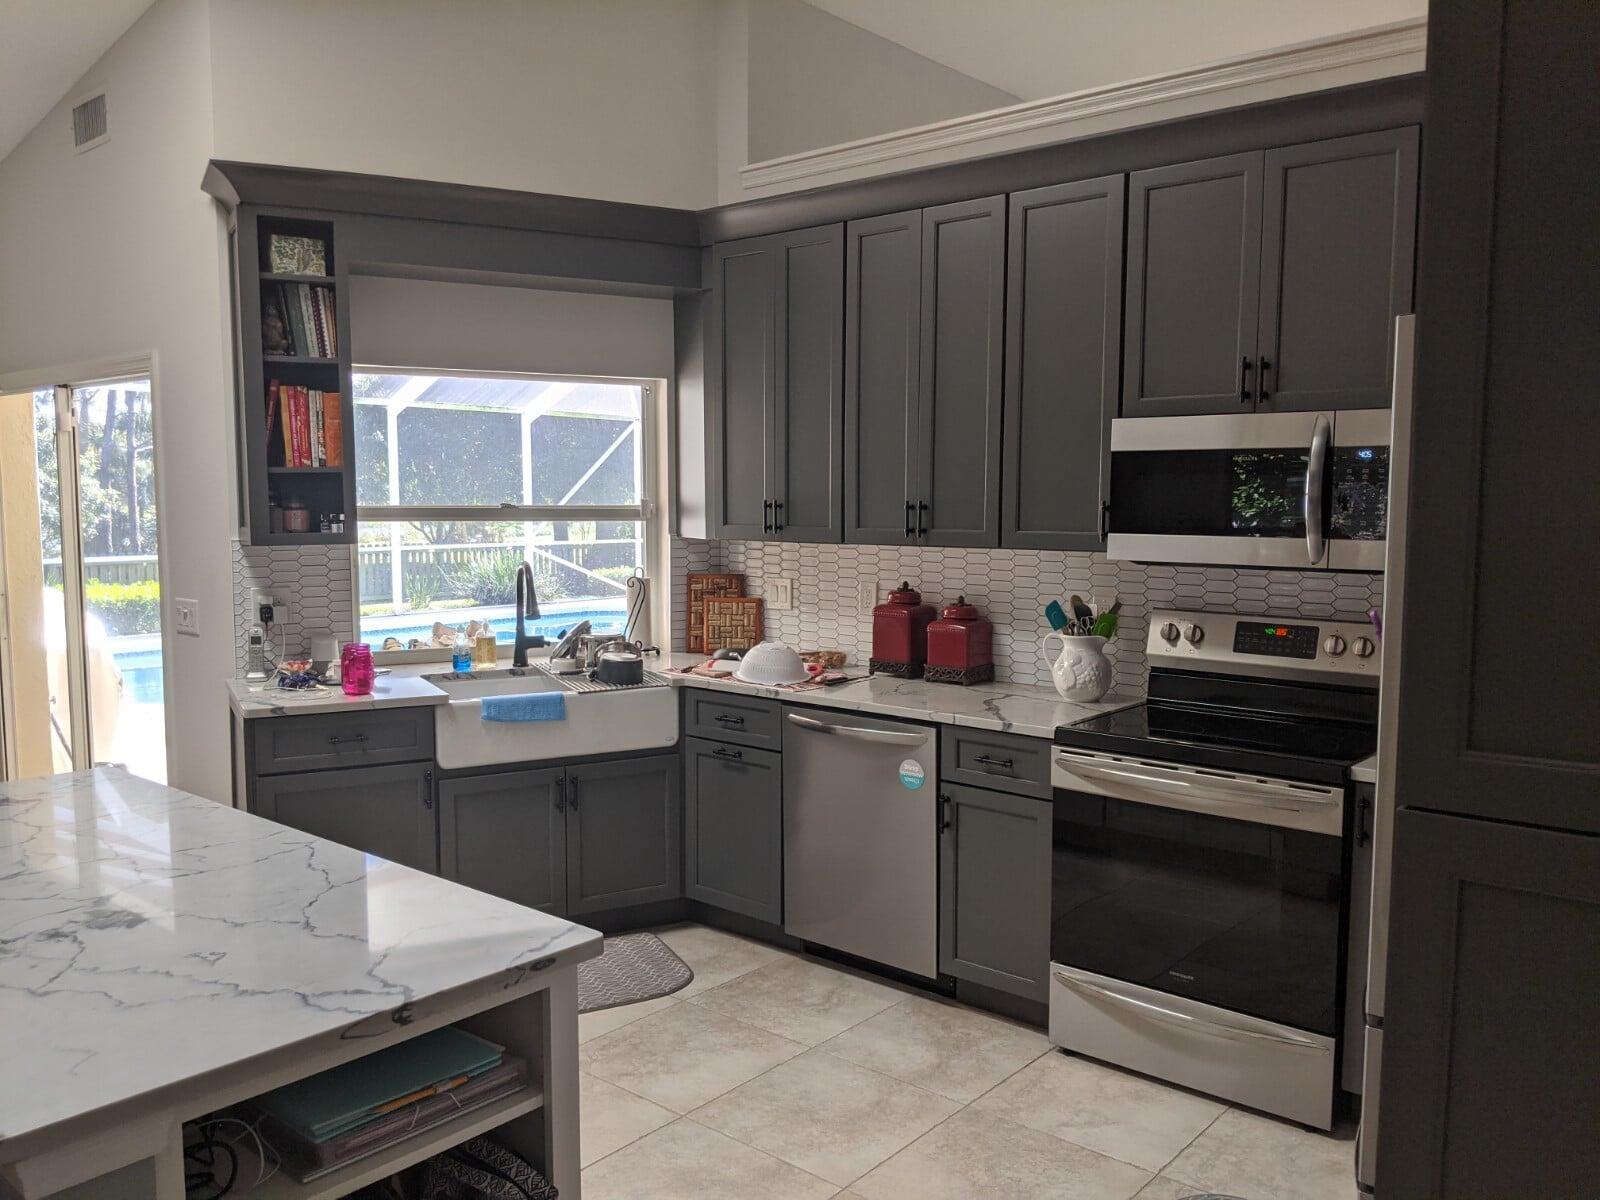 Dark cabinets in Stuart, FL from Agler Kitchen, Bath & Floors